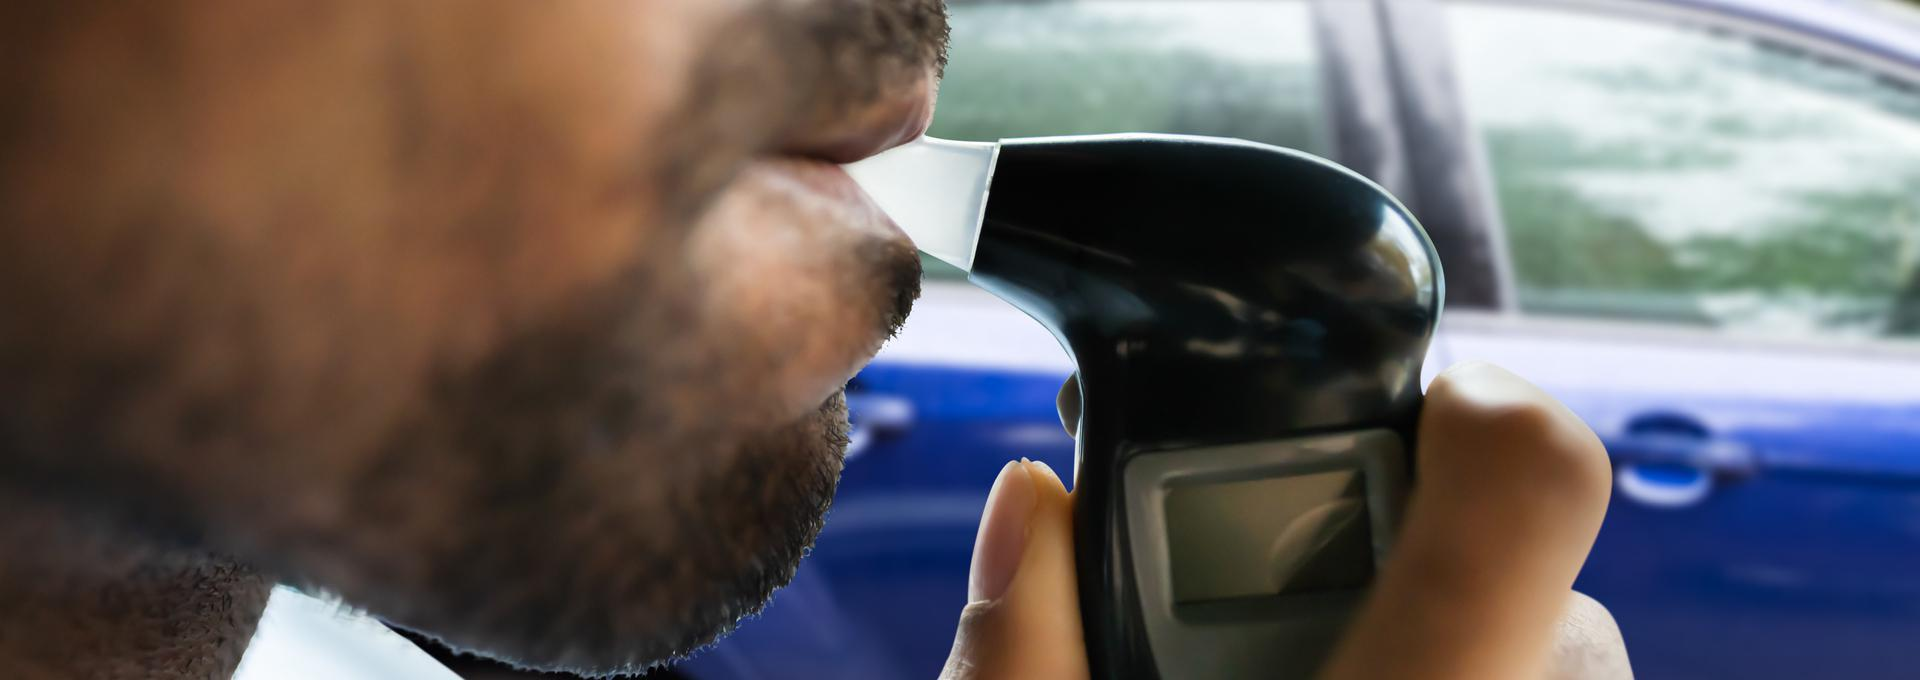 Non-DOT Breath Alcohol Testing - info-hero